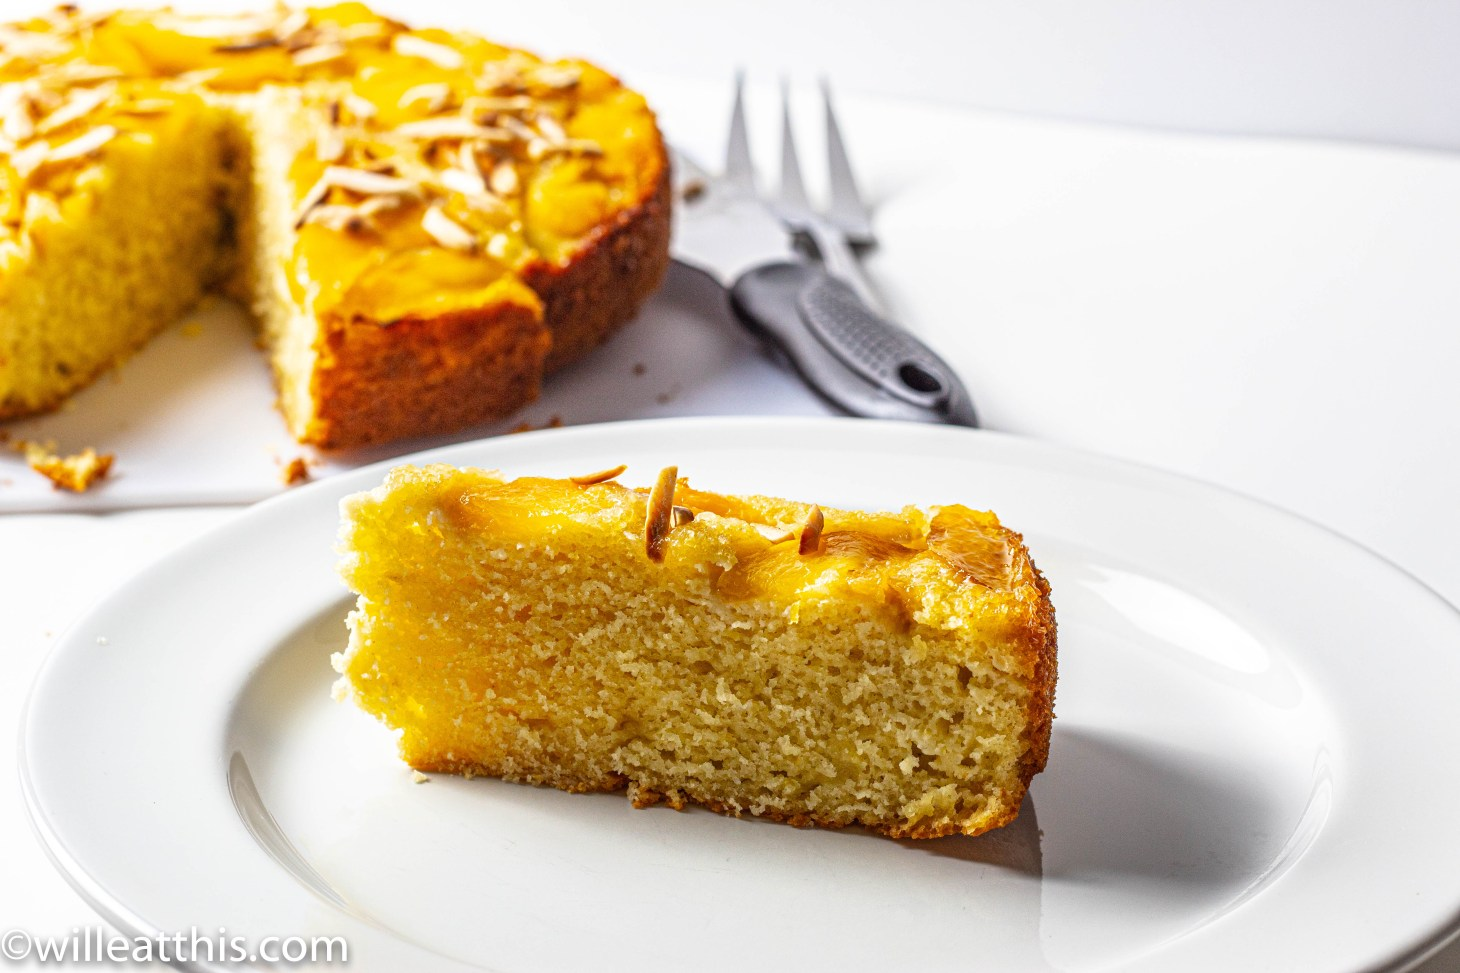 Slice of Upside Down Peach Olive Oil cake